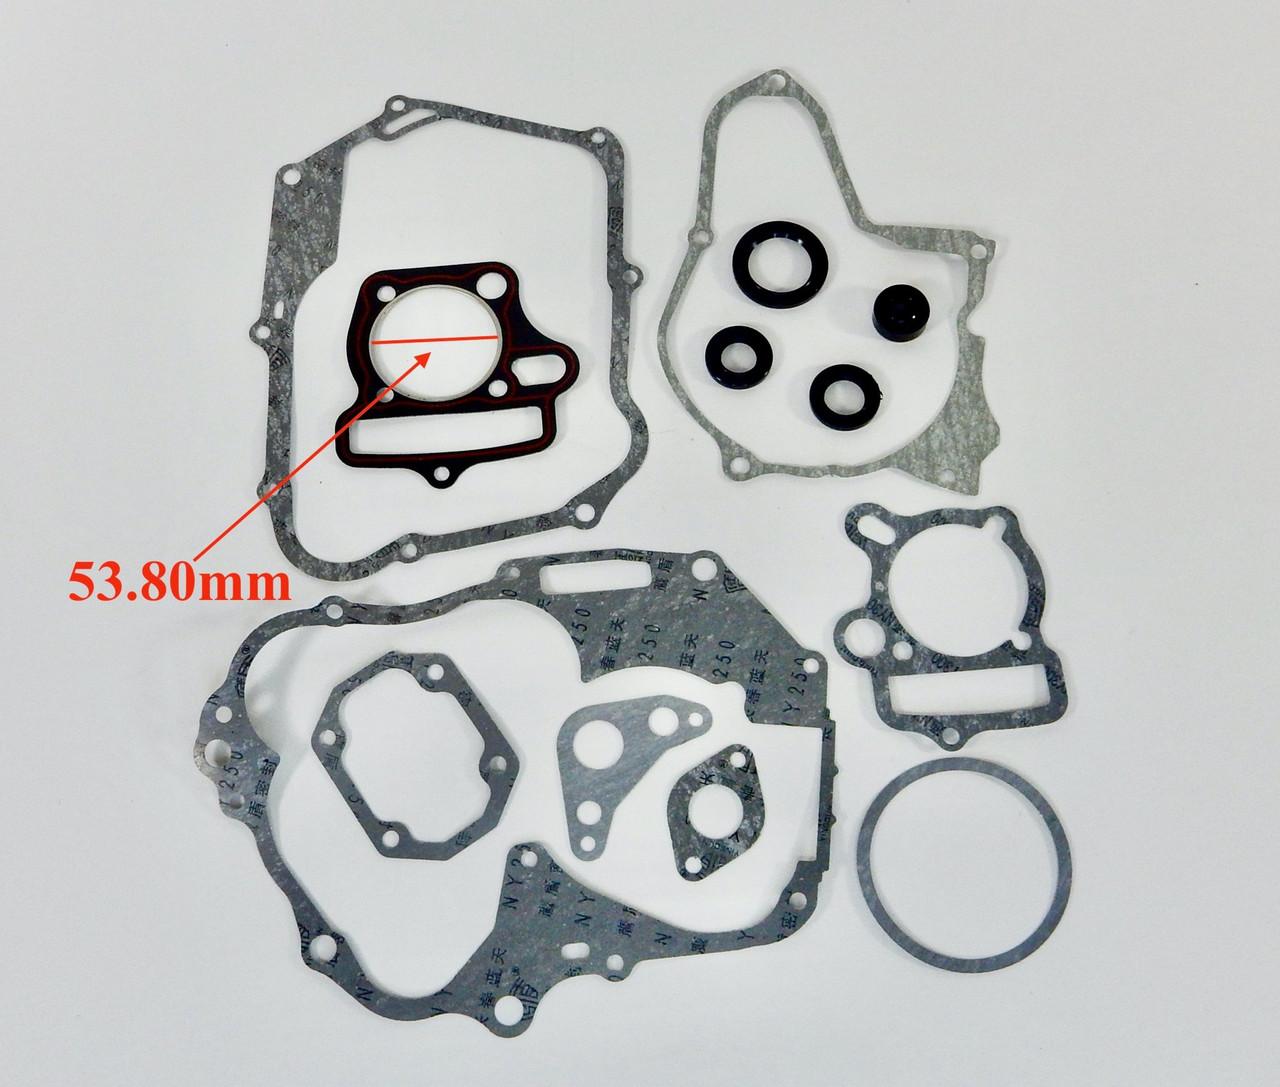 125cc (54mm) E22 GASKET KIT FOR CHINESE ATV DIRT BIKE CLONE MOTORS *LARGE SET*